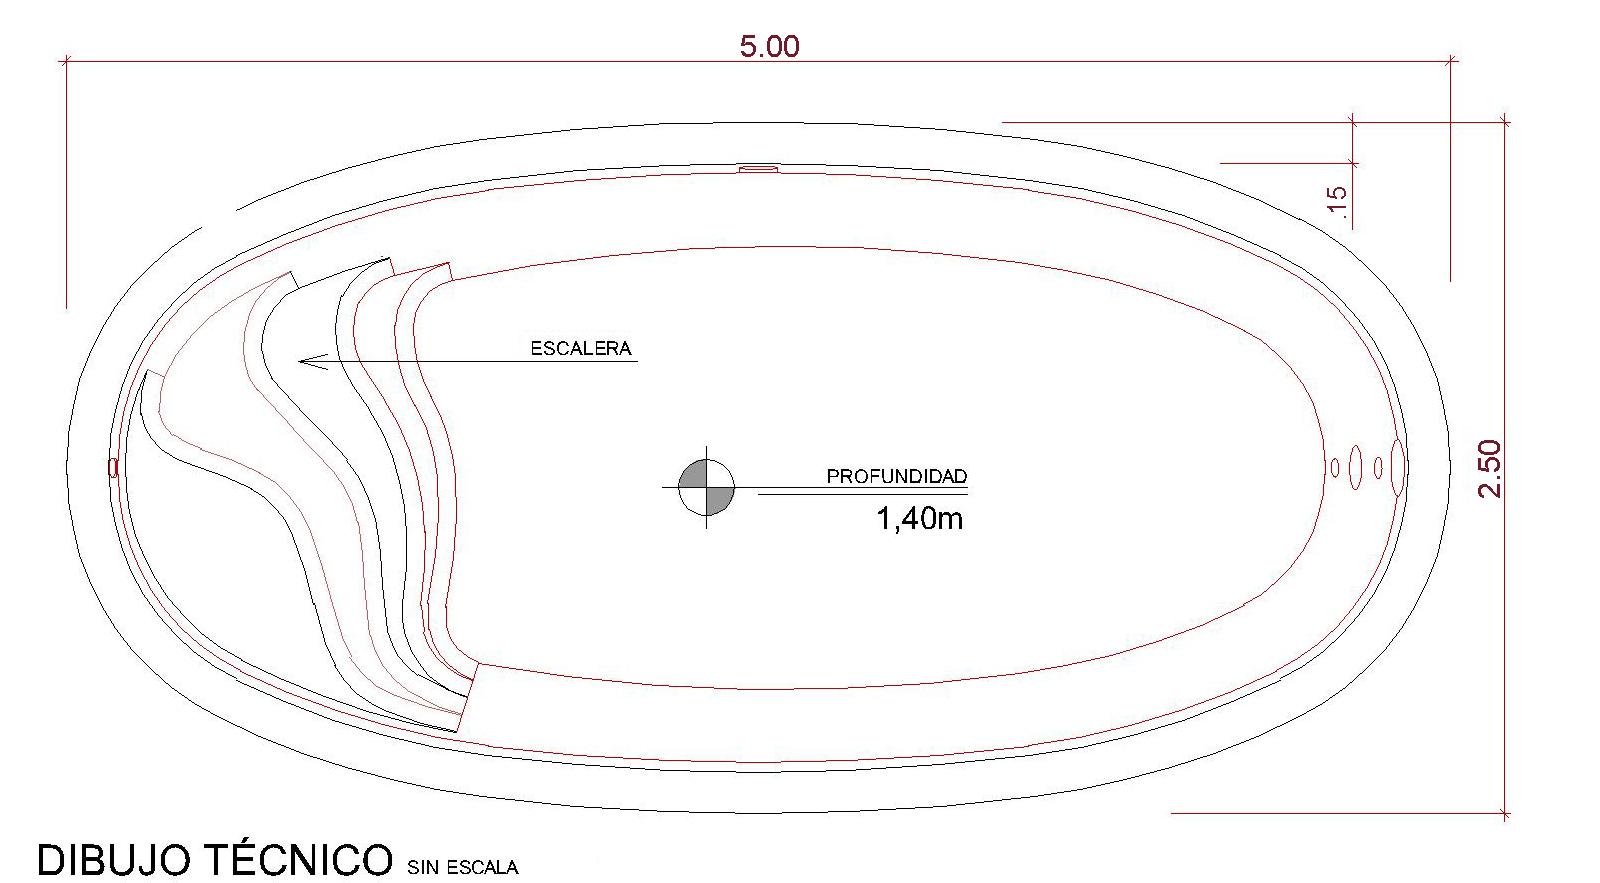 Dibujos técnicos Fiji (sin escala)